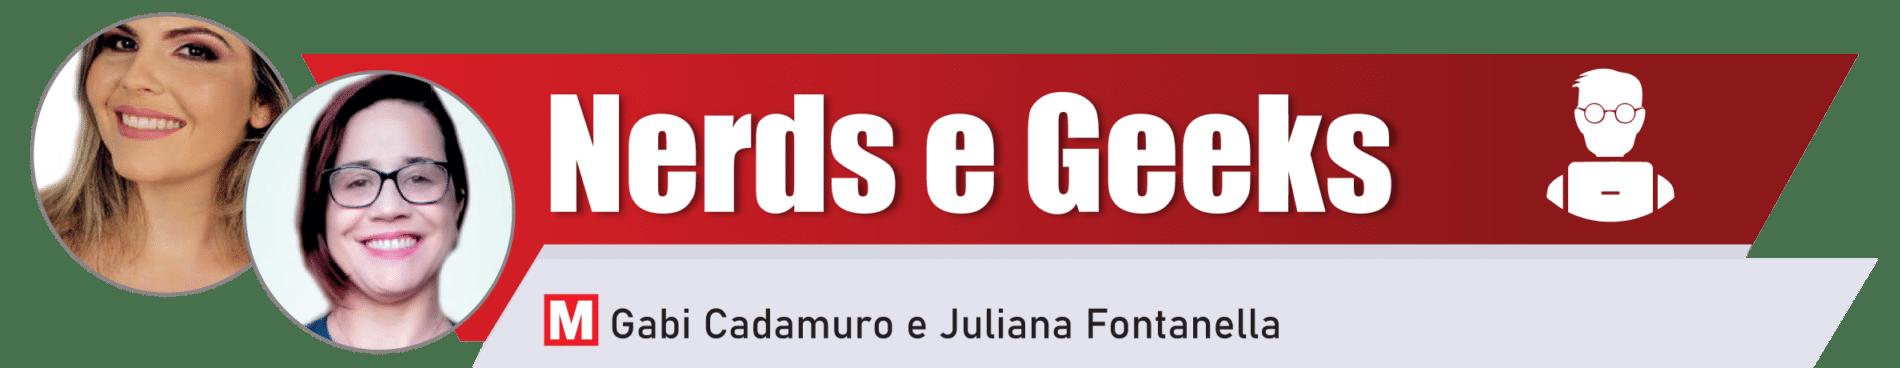 Nerds e Geeks por Gabi Cadamuro e Juliana Fontanella